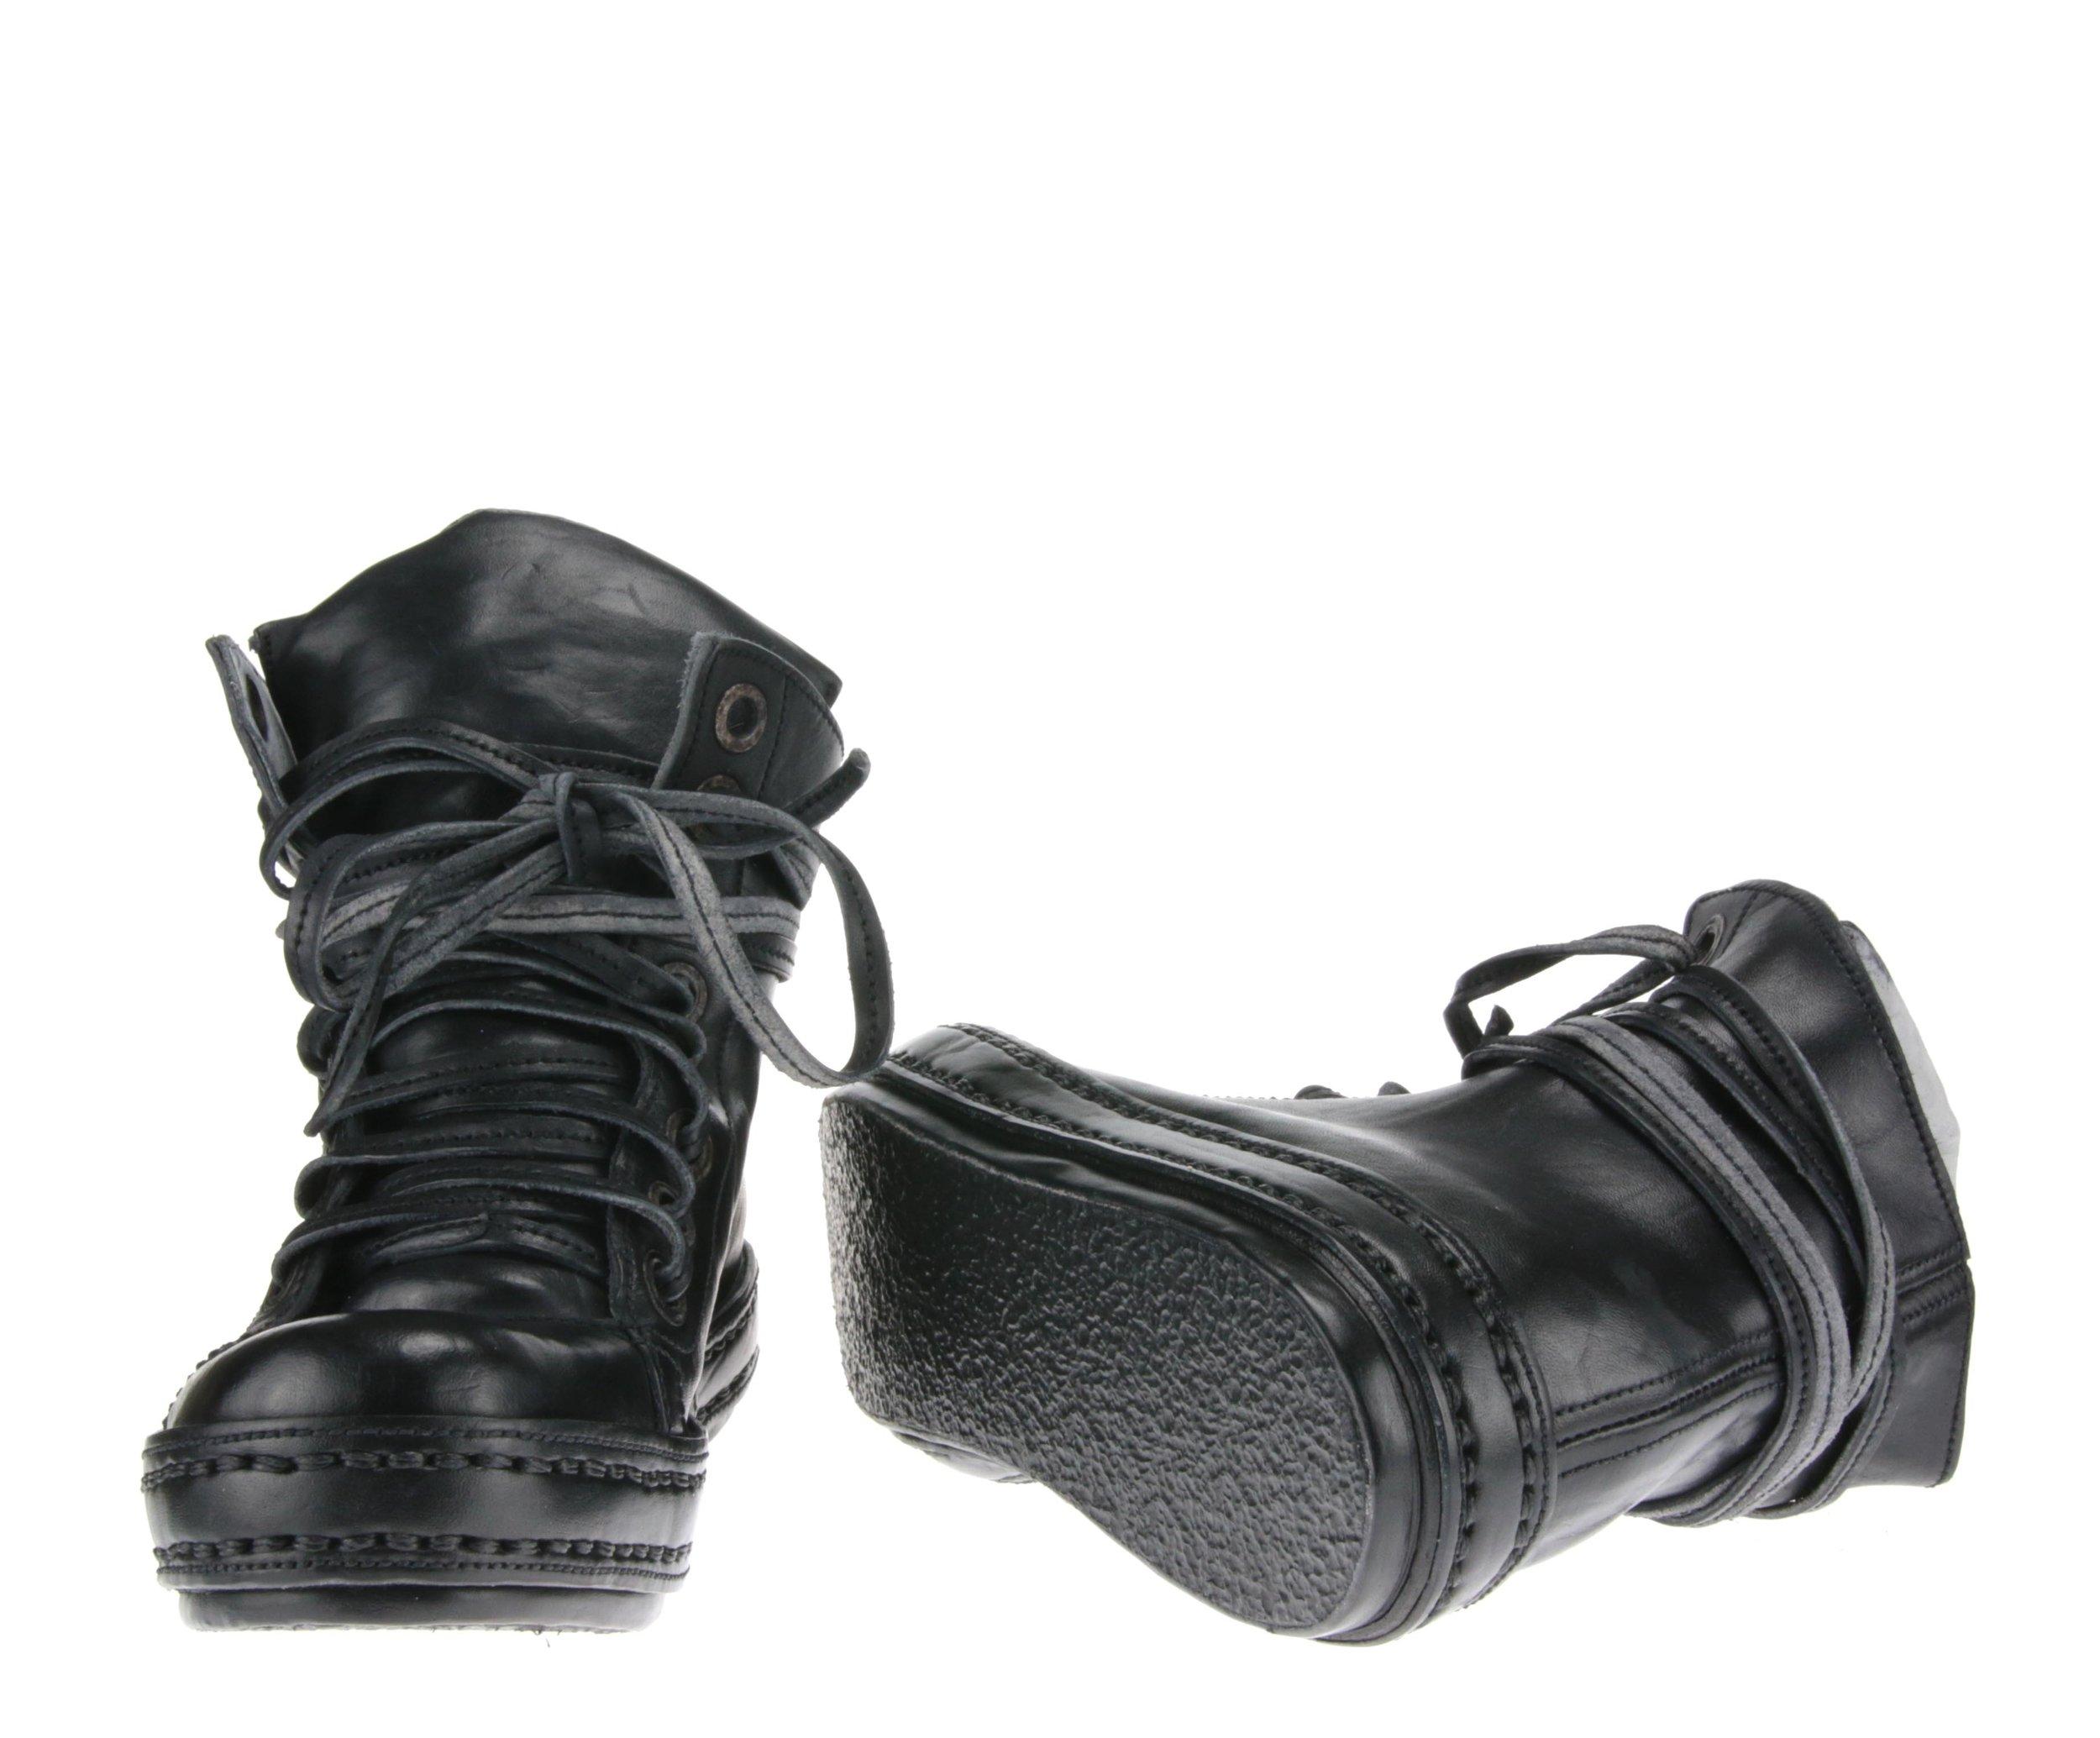 8Holes Black front sole.jpg